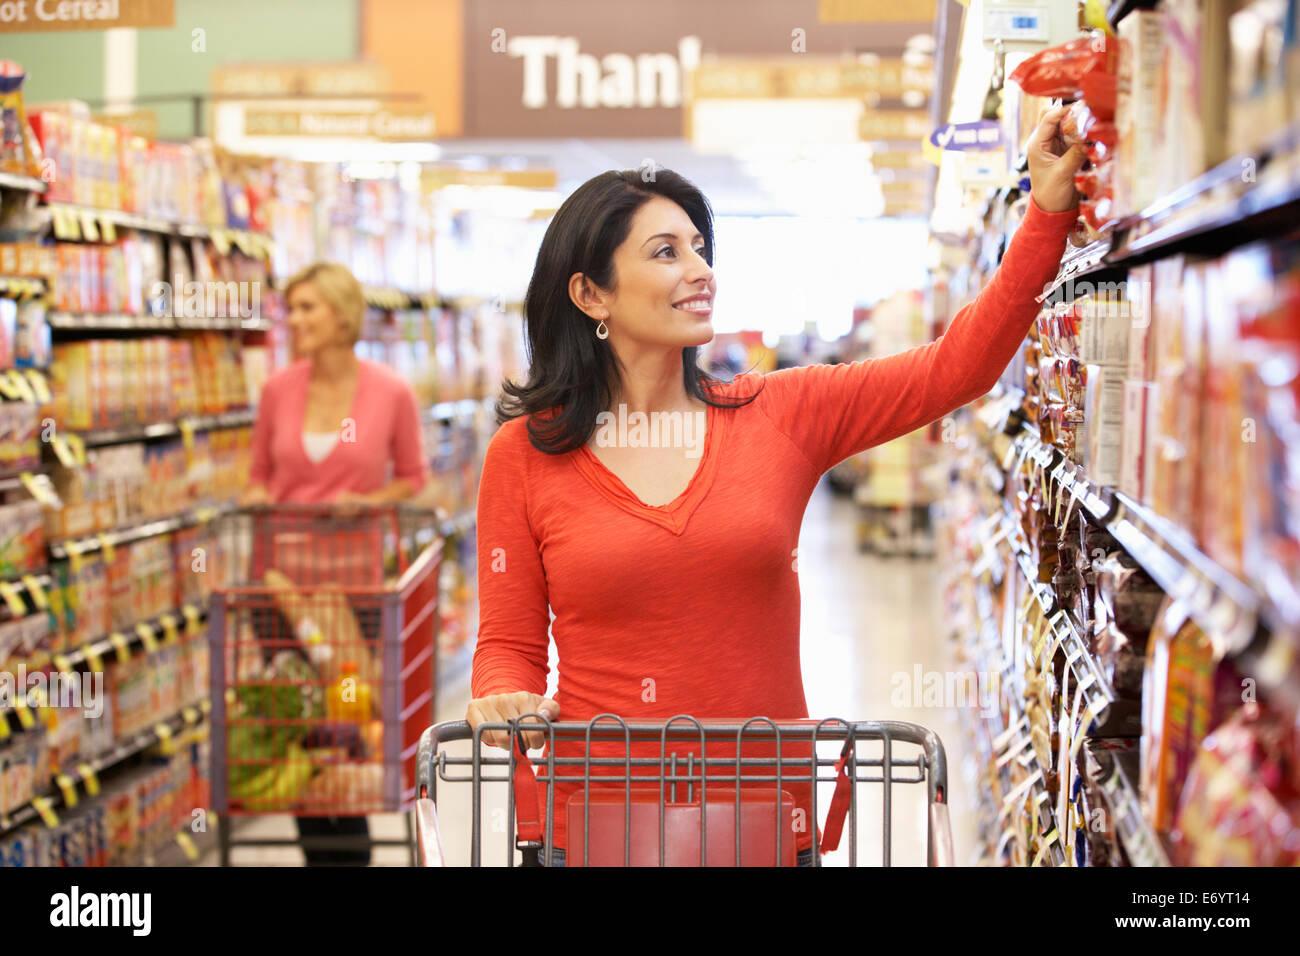 Women shopping in supermarket - Stock Image